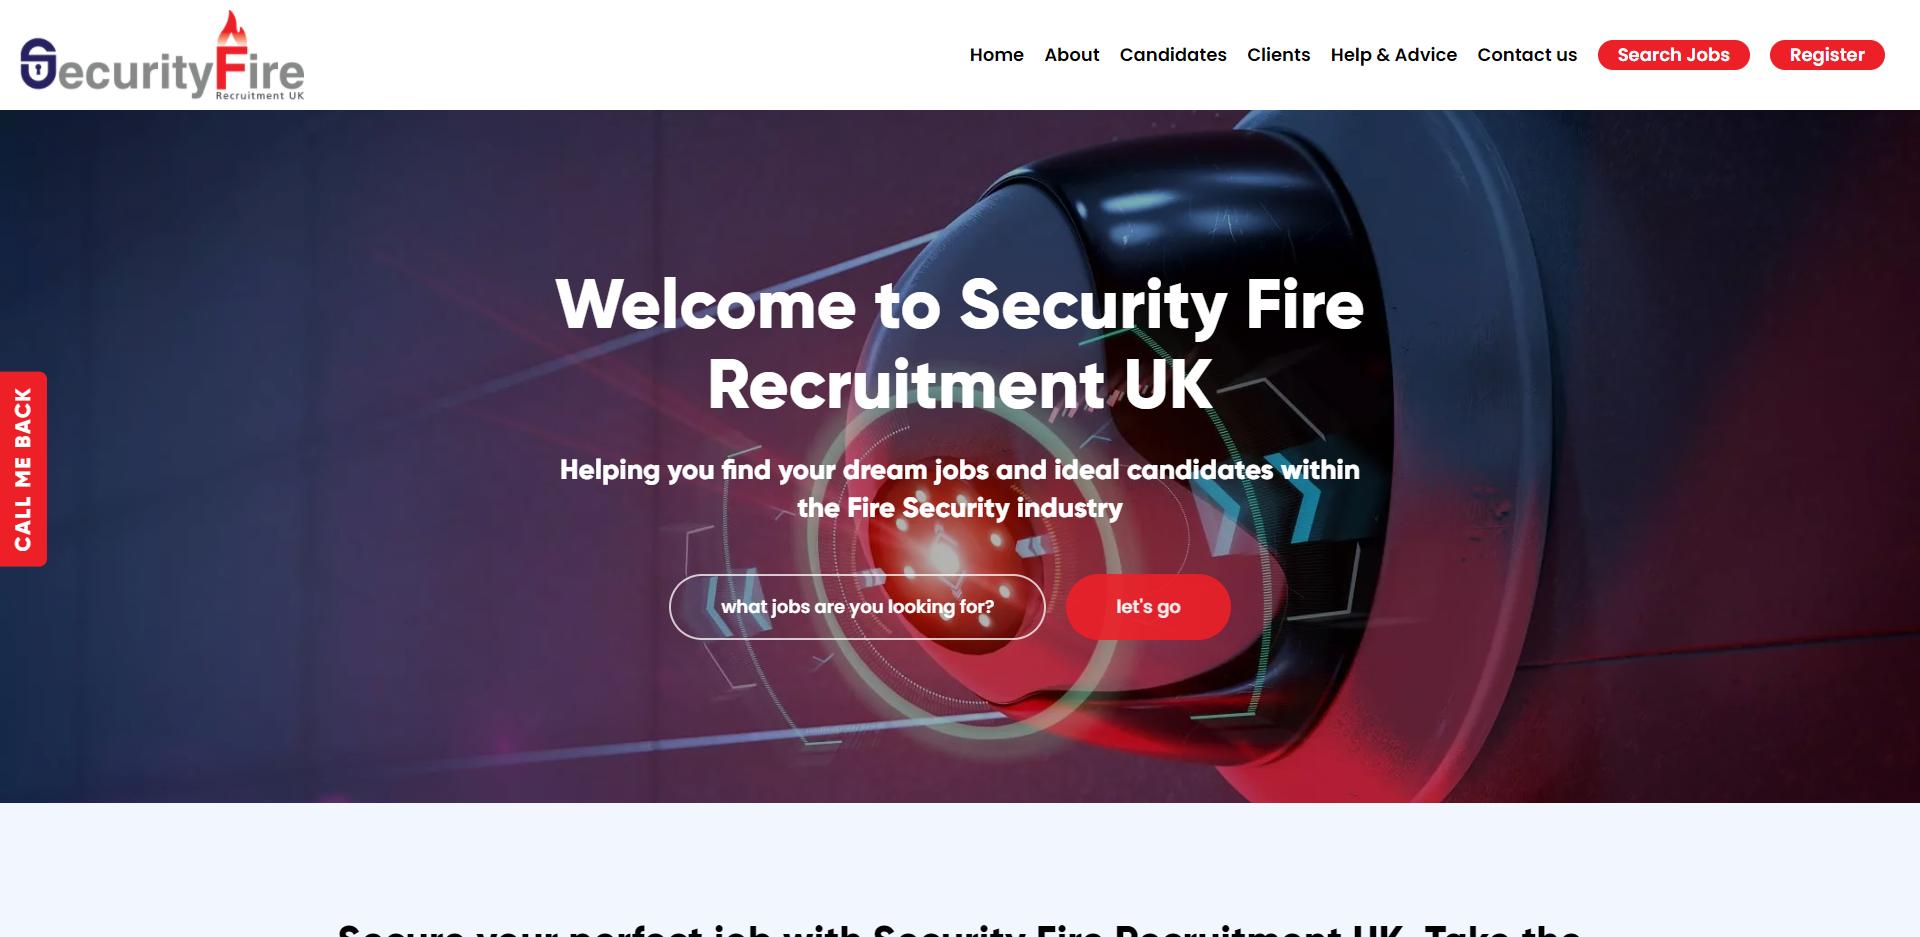 Security Fire Recruitment